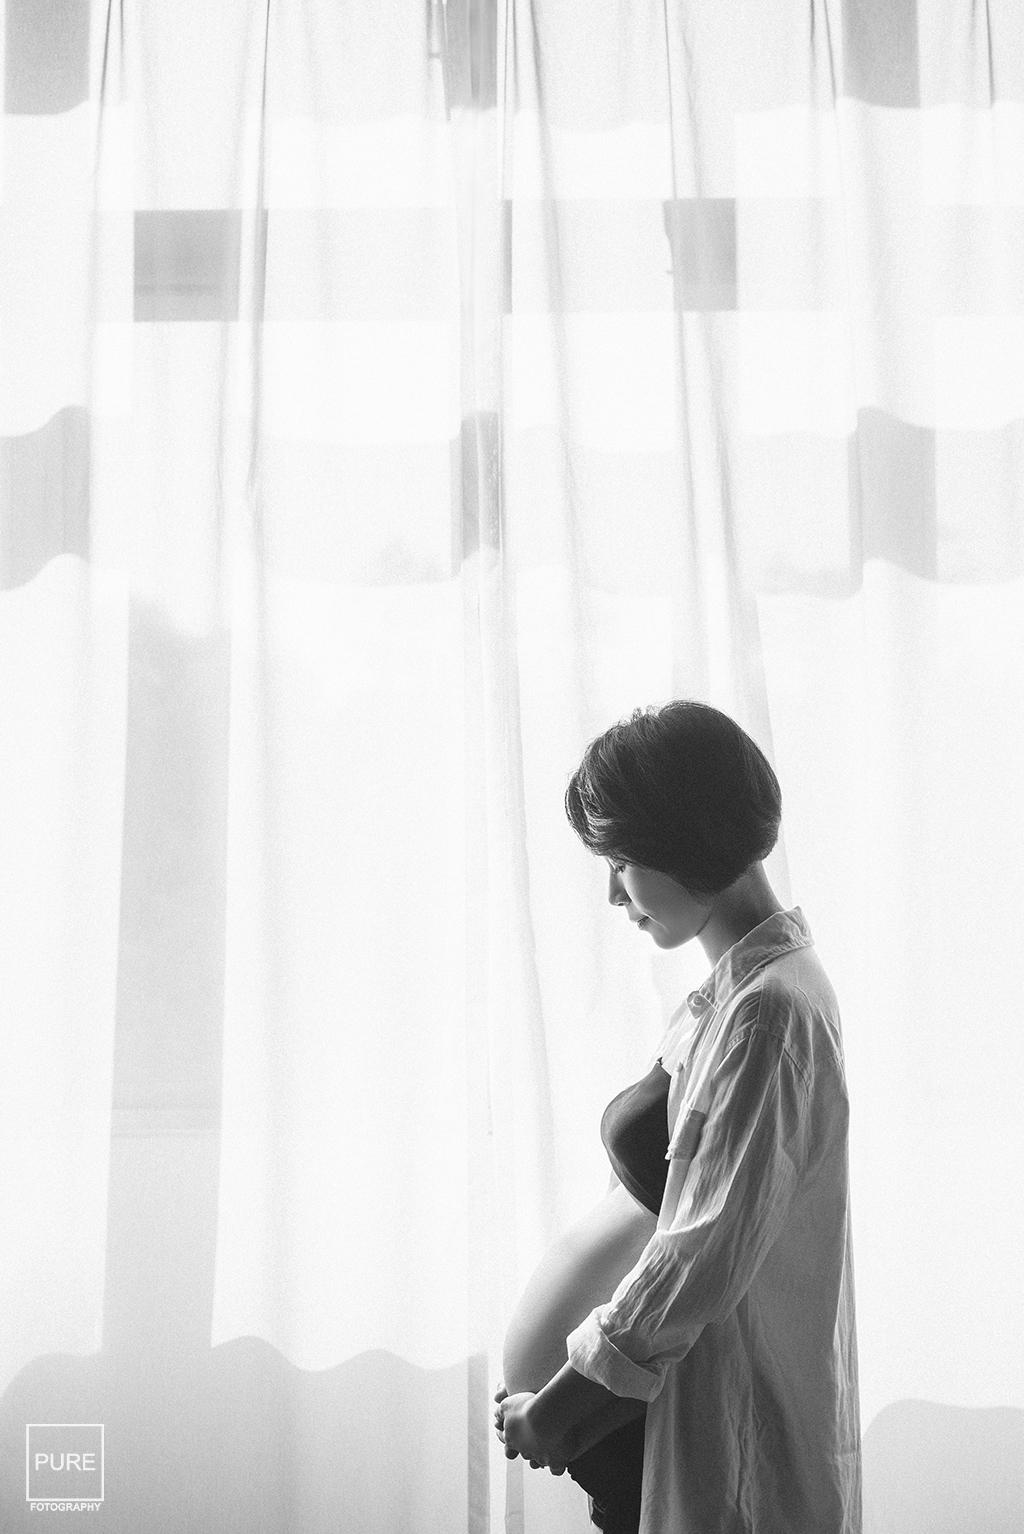 PUREFOTO_台灣孕婦攝影Pregnant_孕婦寫真剪影